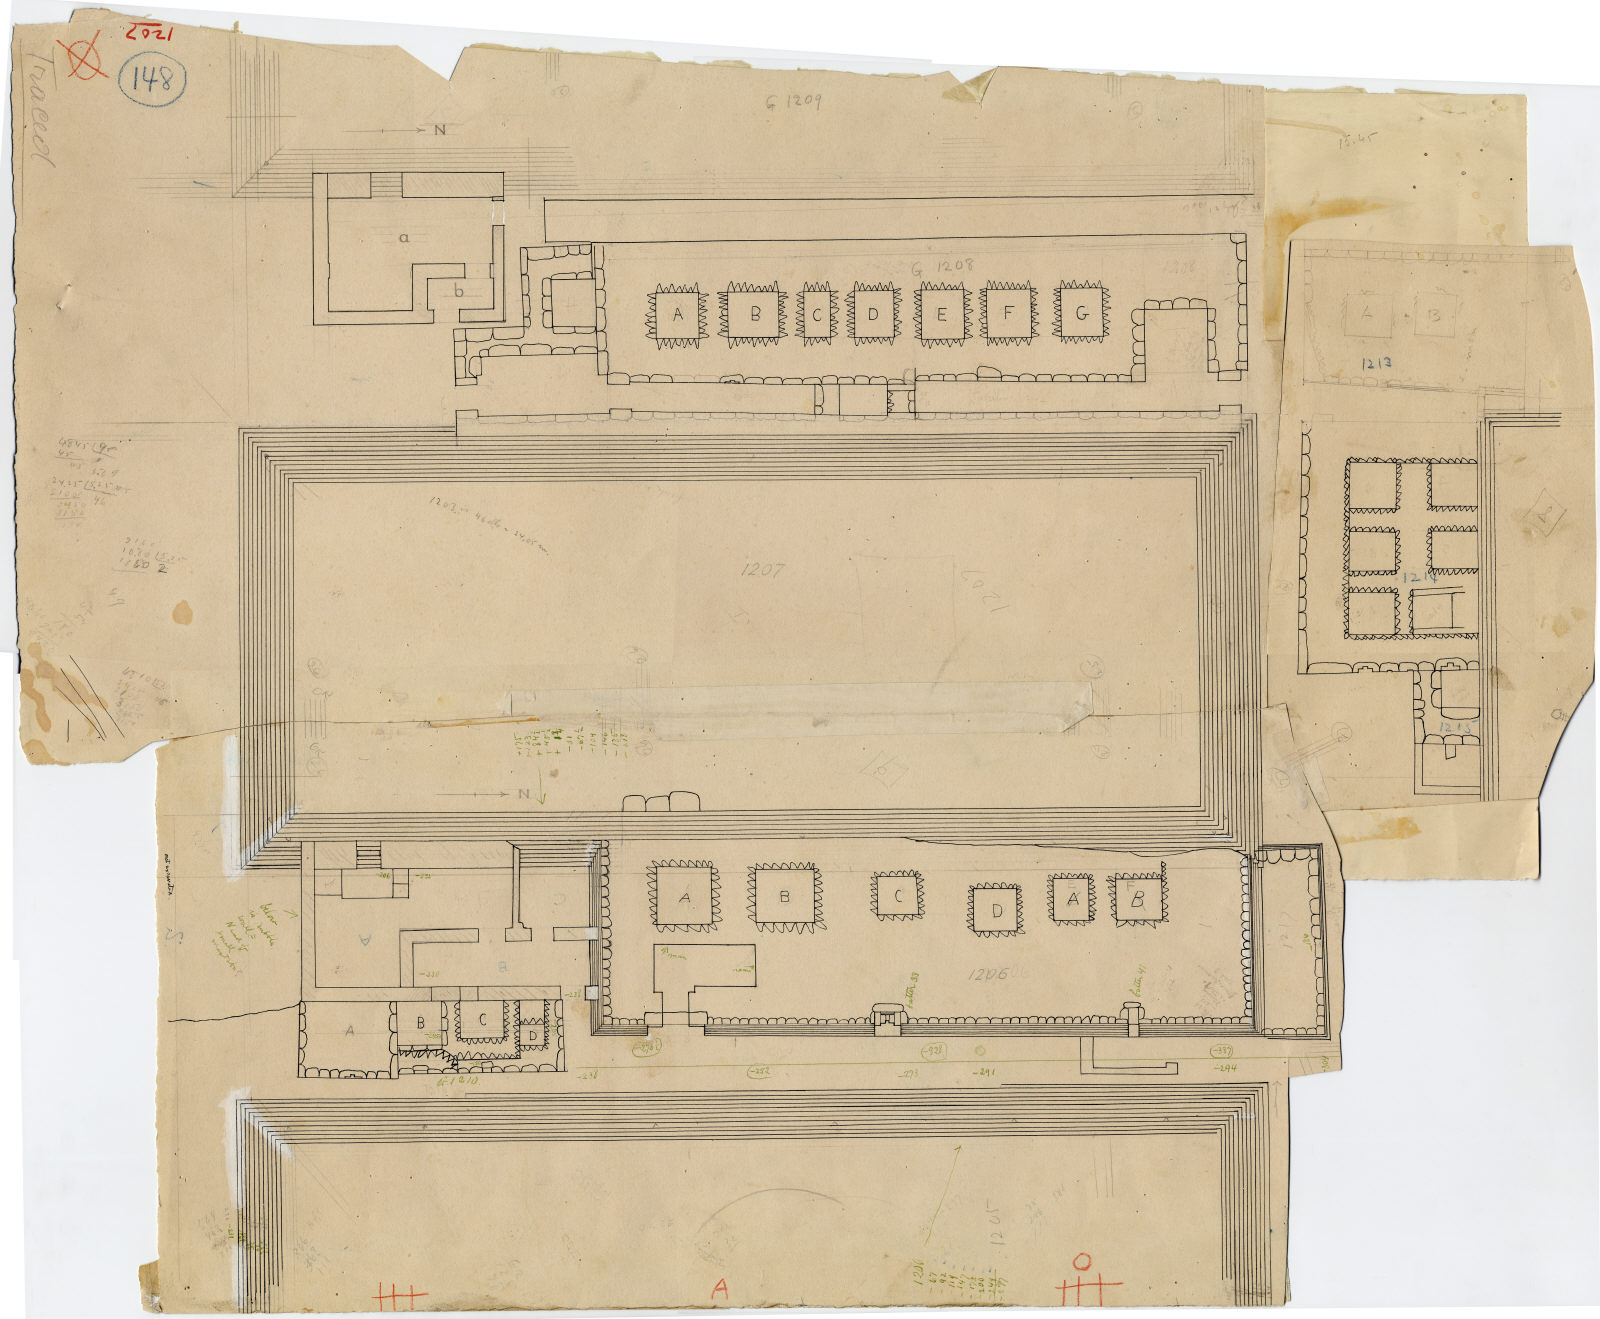 Maps and plans: Plan of G 1205, G 1206, G 1207, G 1208, G 1209, G 1210, G 1212, G 1213, G 1214, G 1215, G 1217